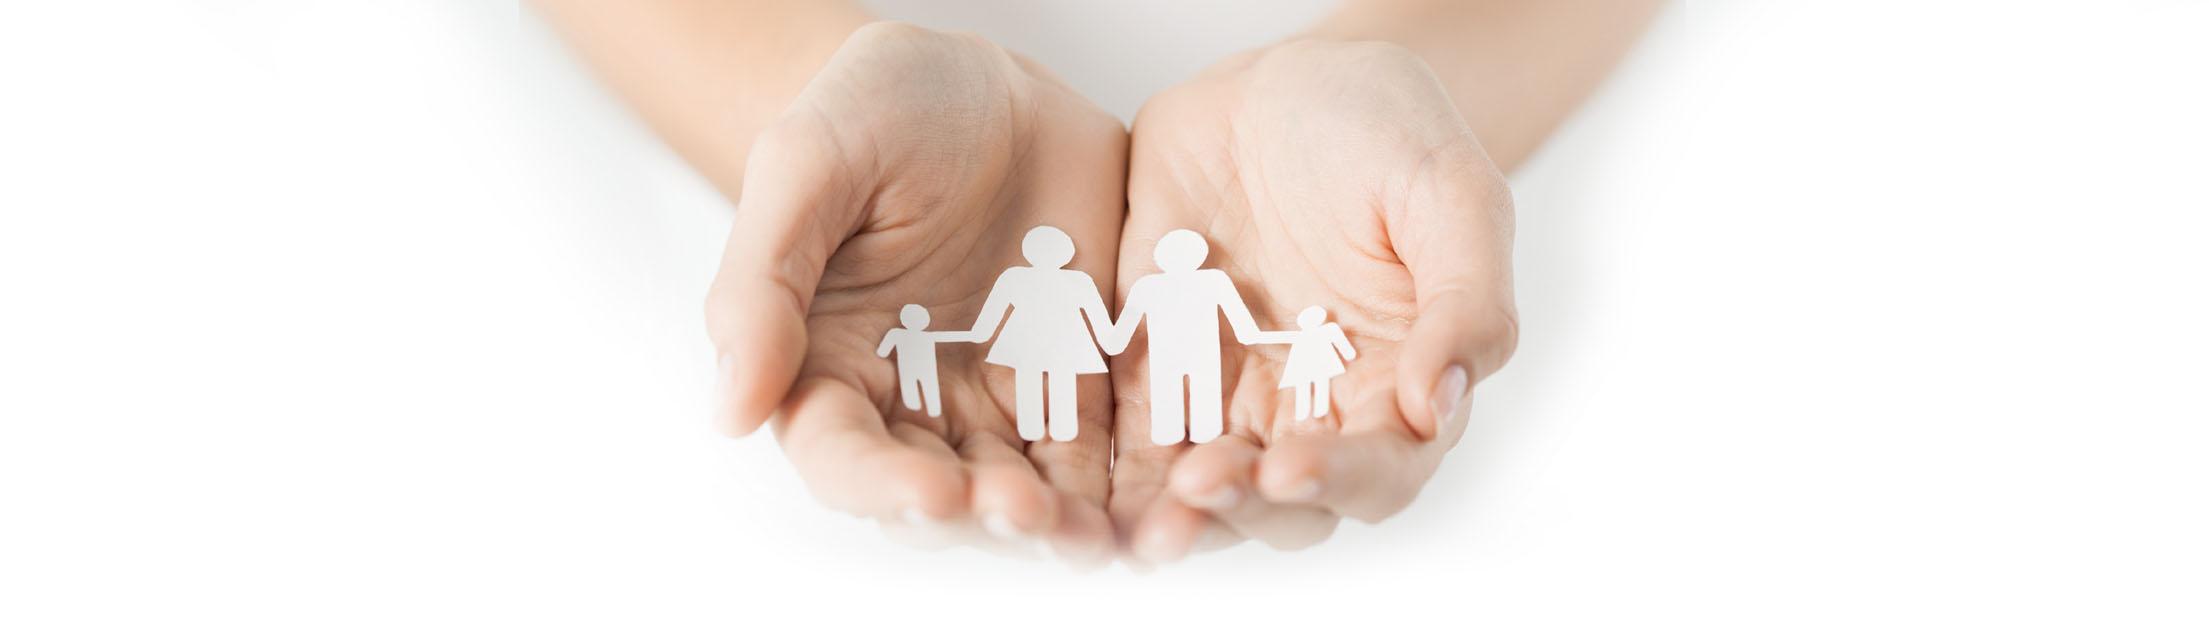 LifeNet Health Family Education Day